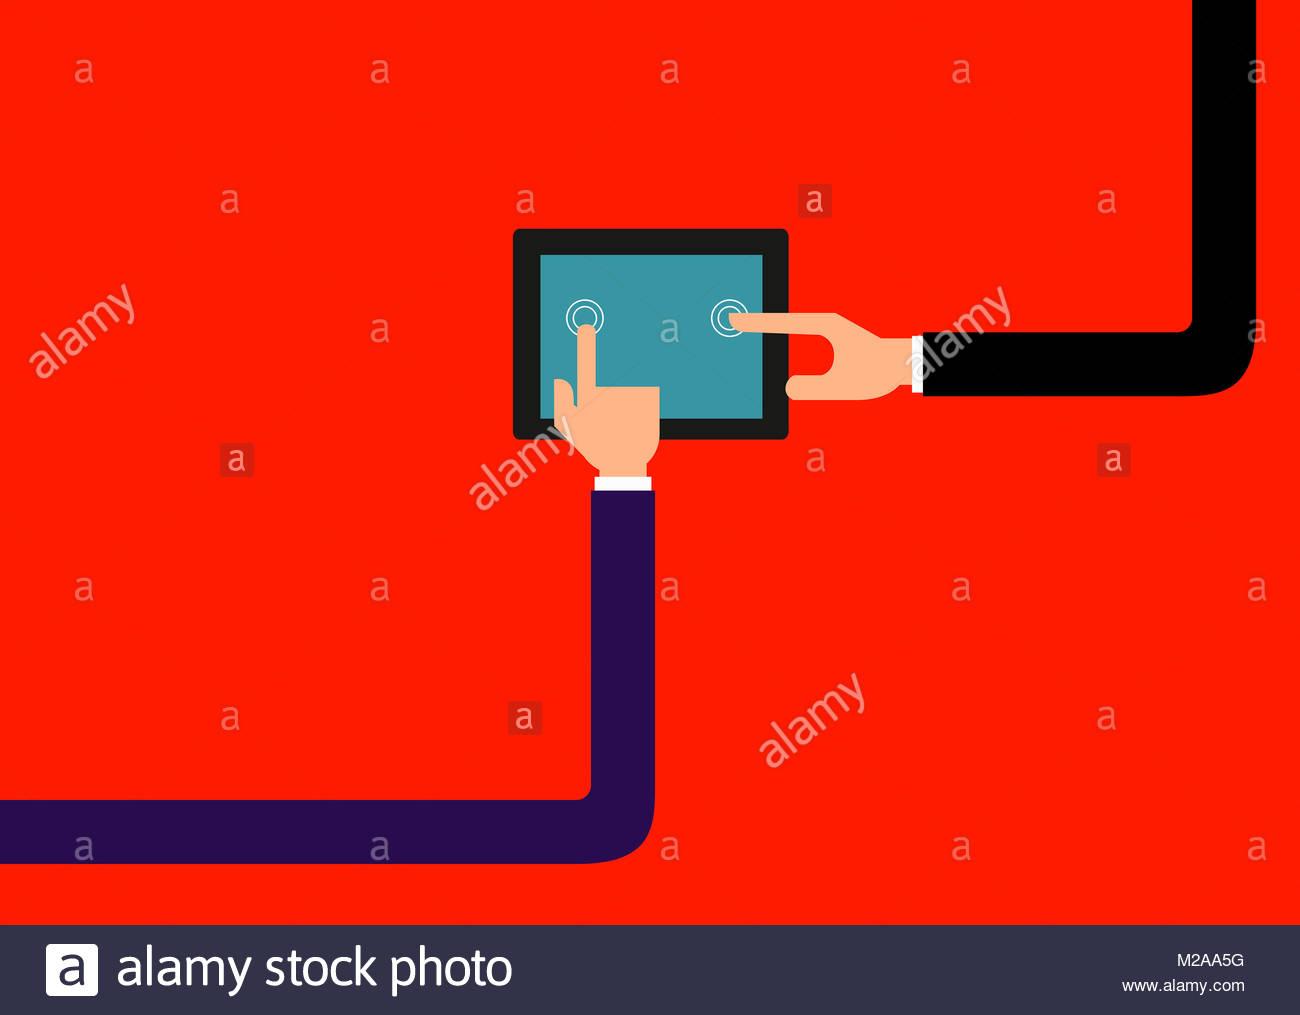 Zwei Geschäftsleute mit digitalen Tablet angeschlossen Stockfoto